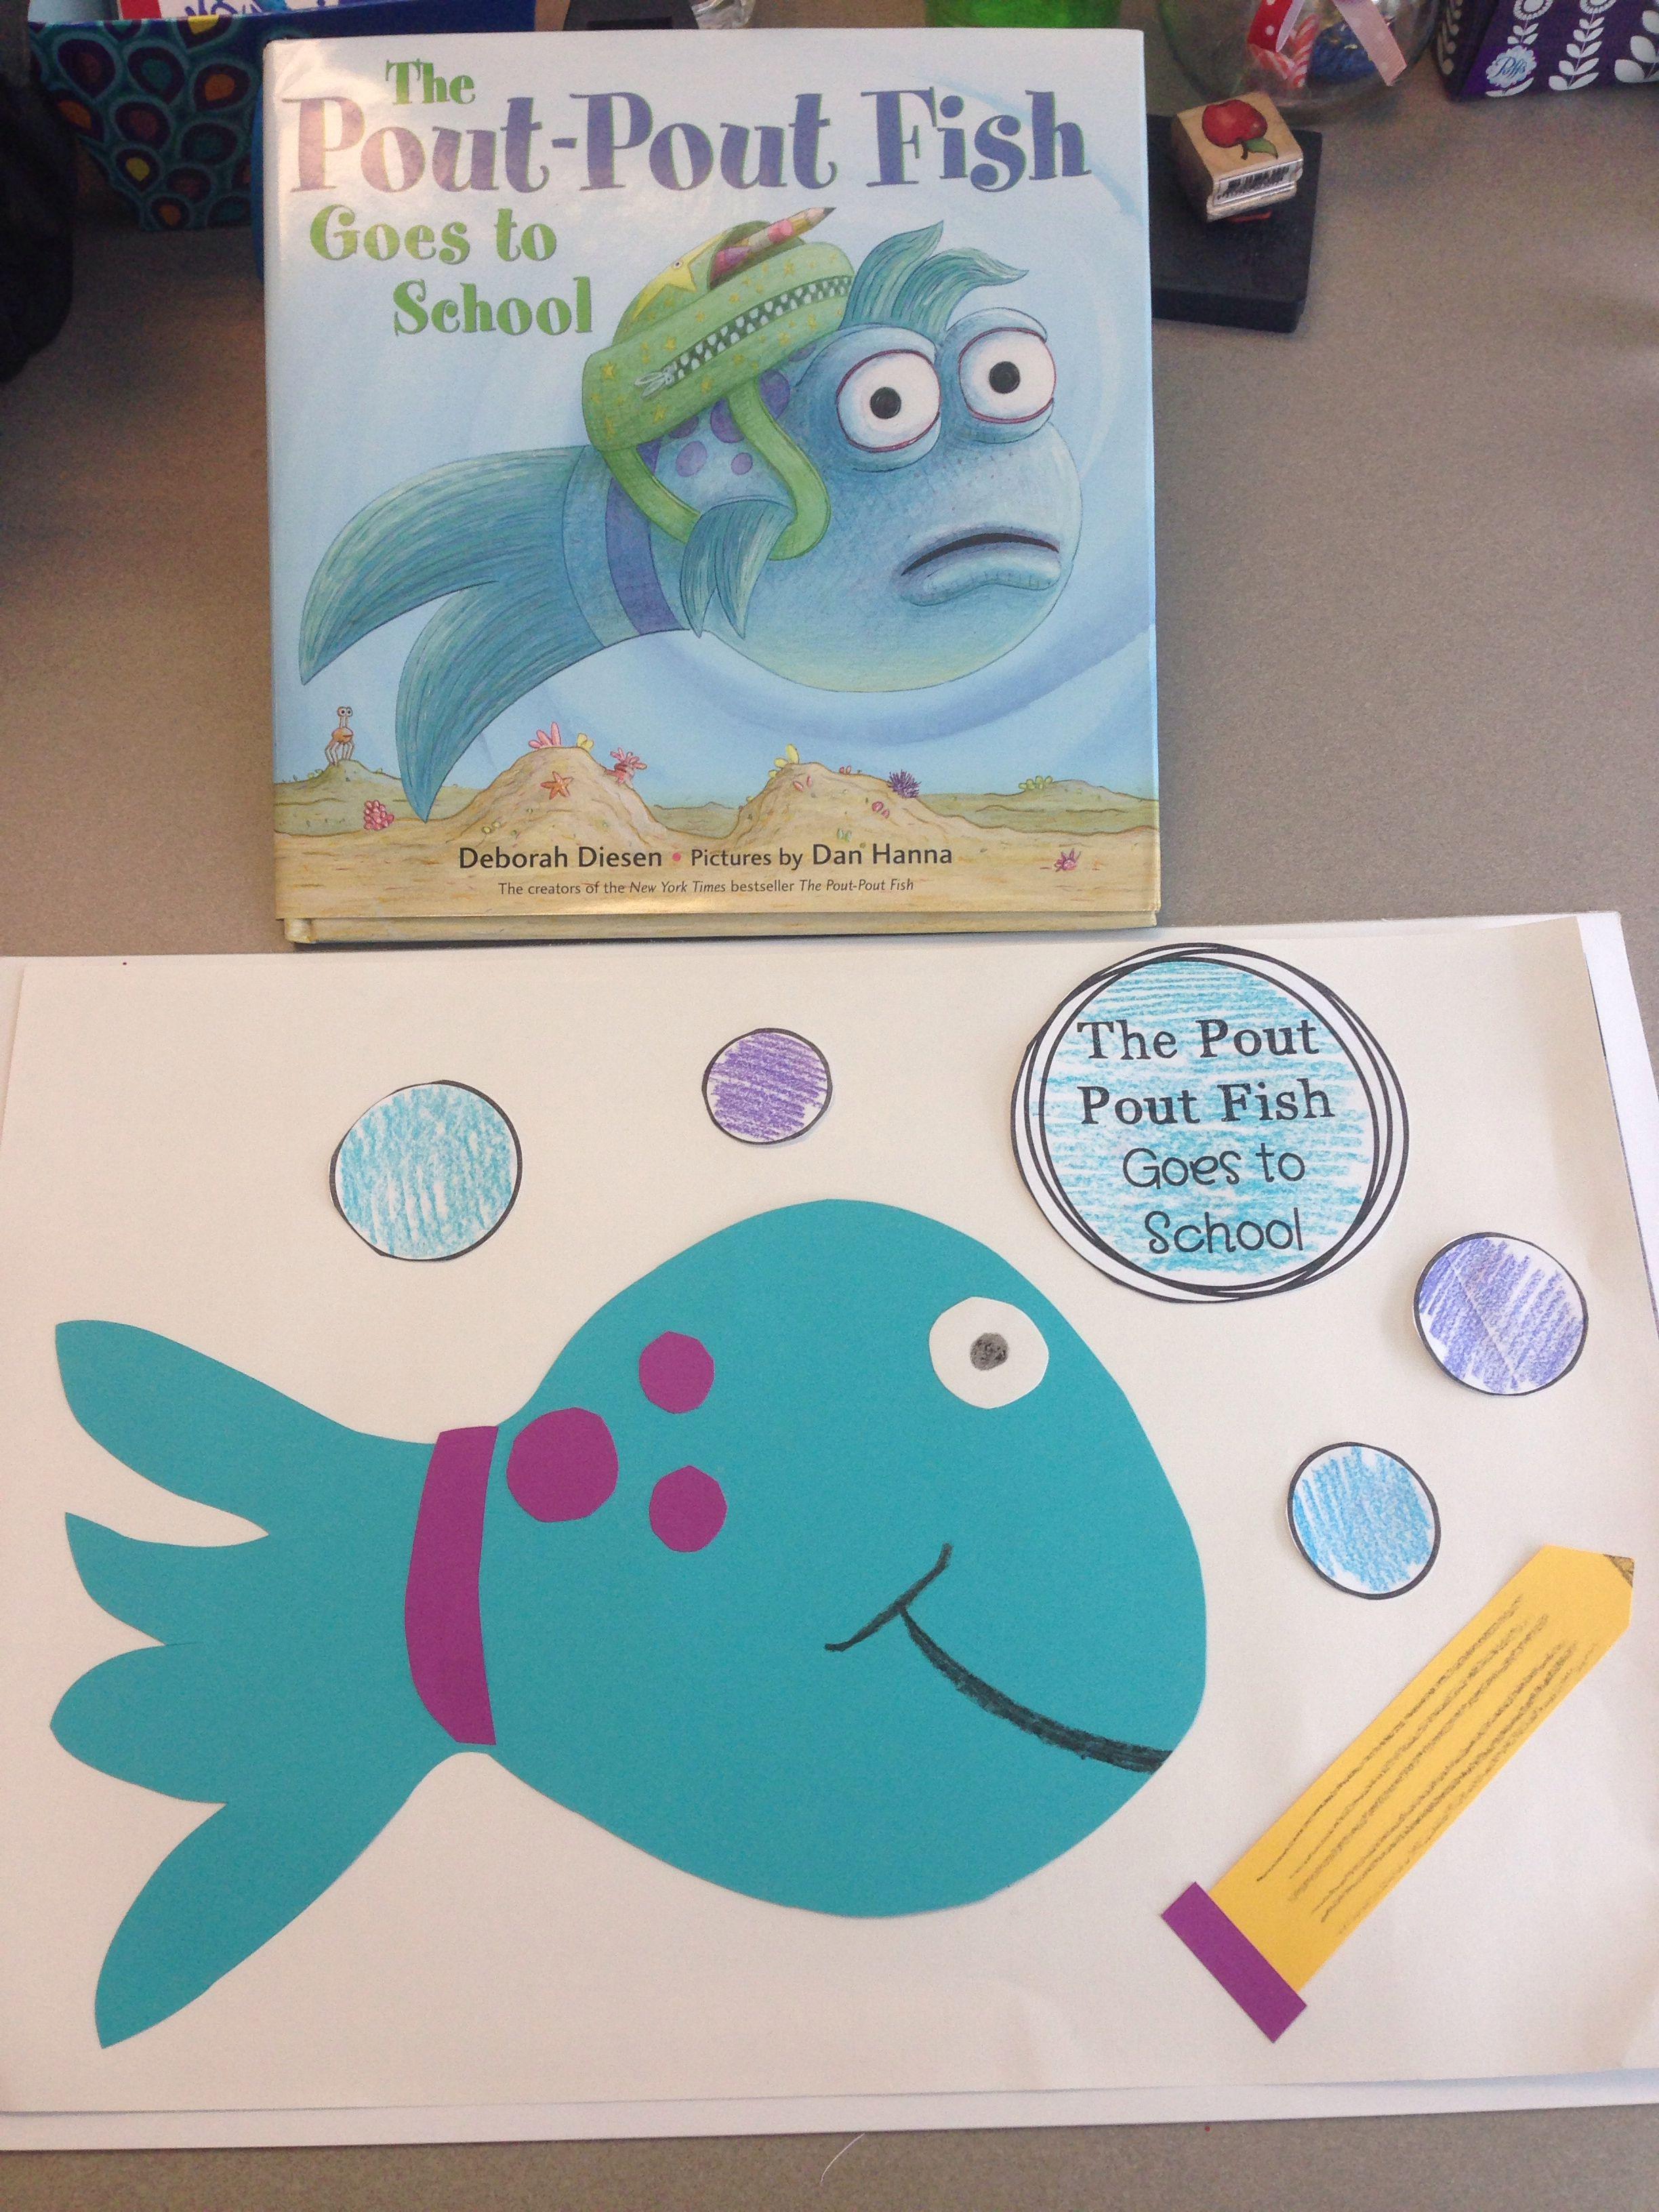 Free Printable Pout Pout Fish Coloring Pages